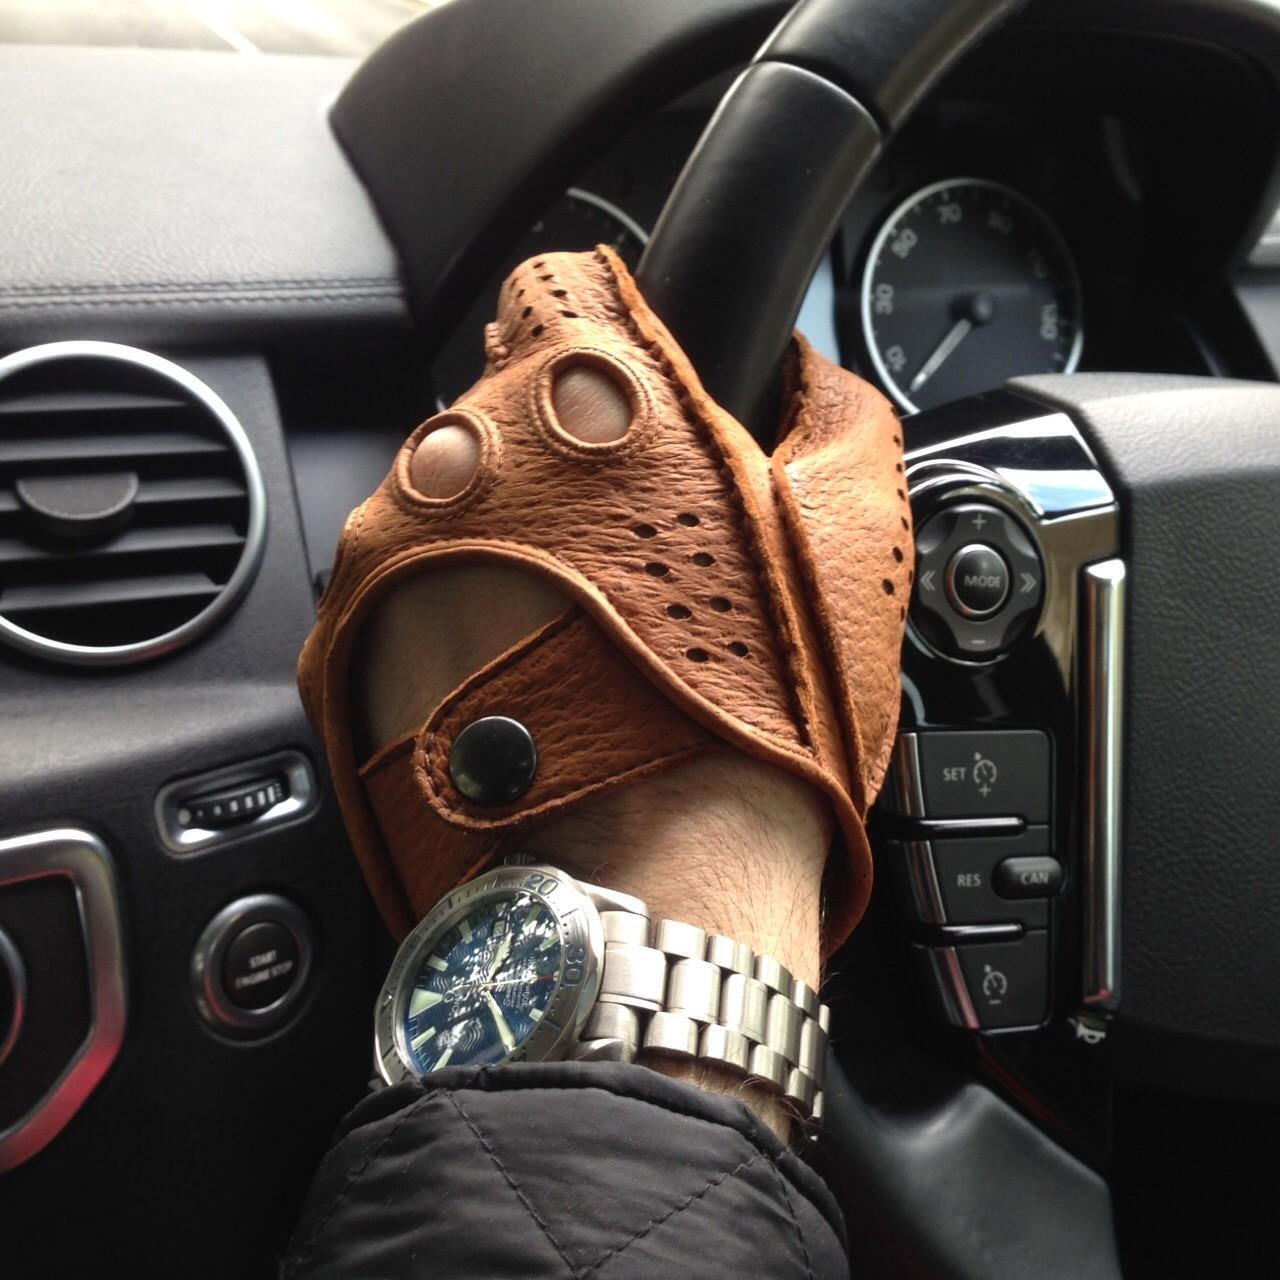 Driving gloves car - Driving Gloves Car 24